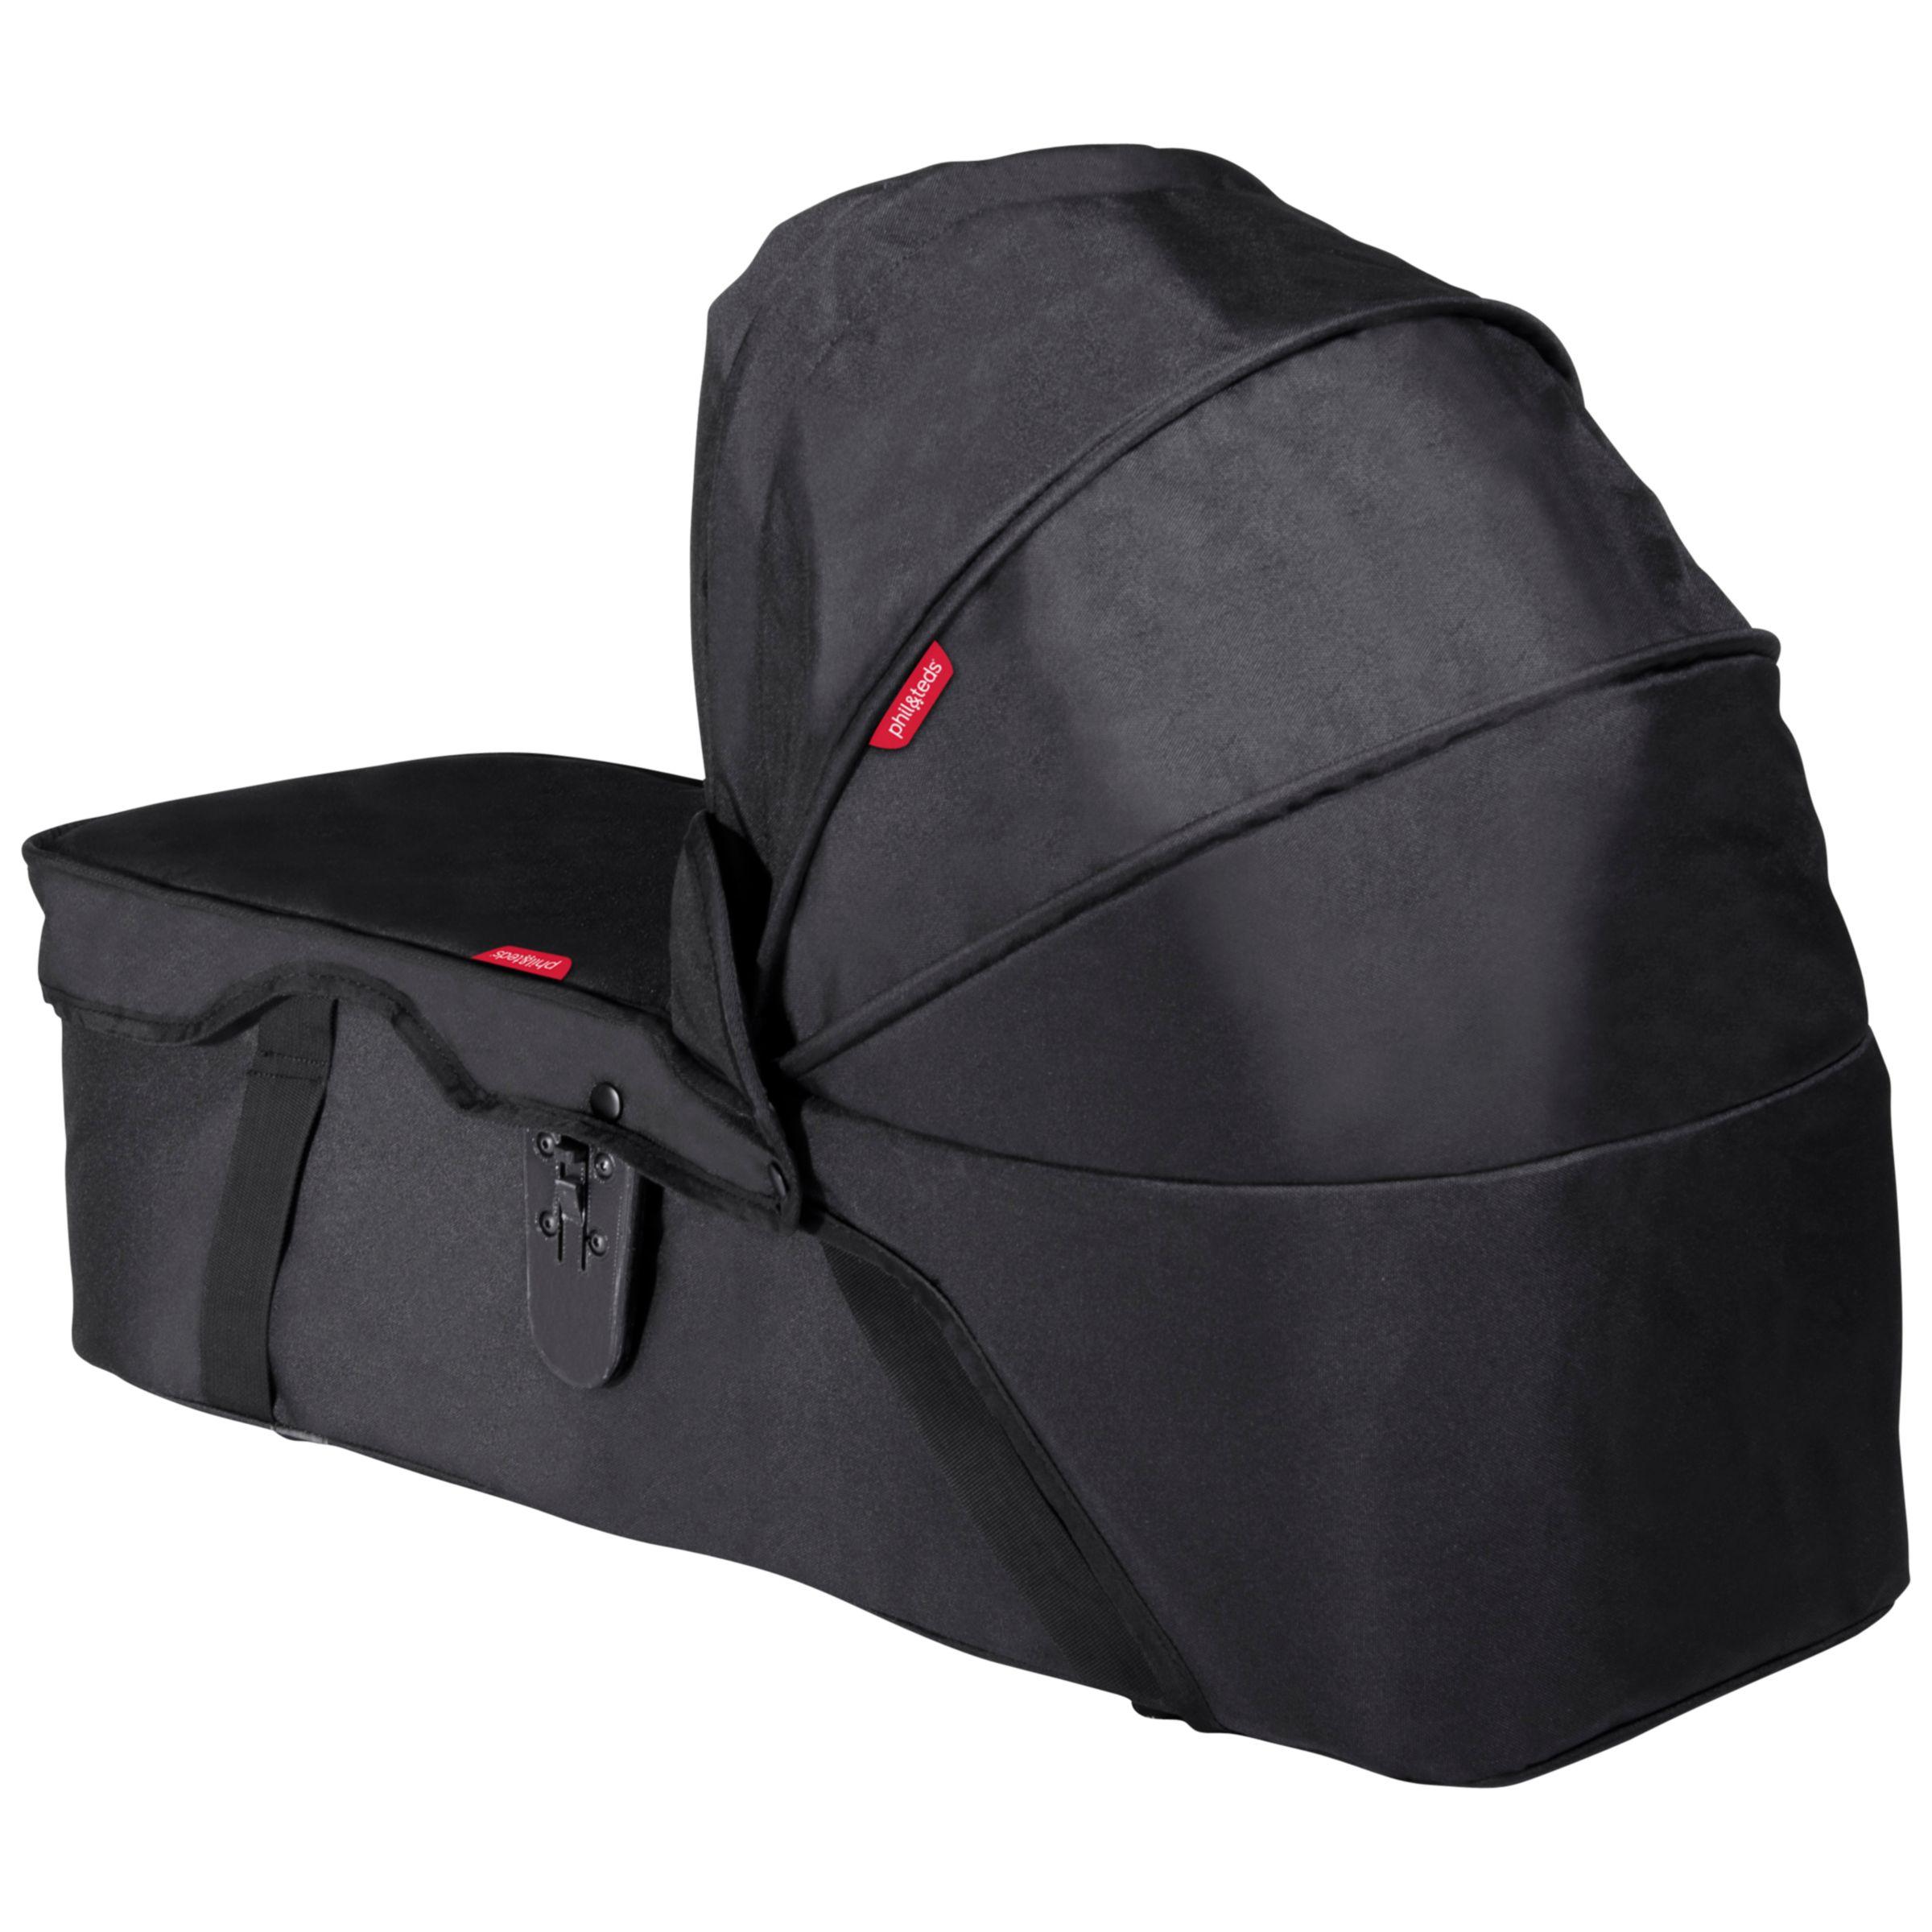 Phil & Teds Phil & Teds Dot/Sport Snug Carrycot, Black